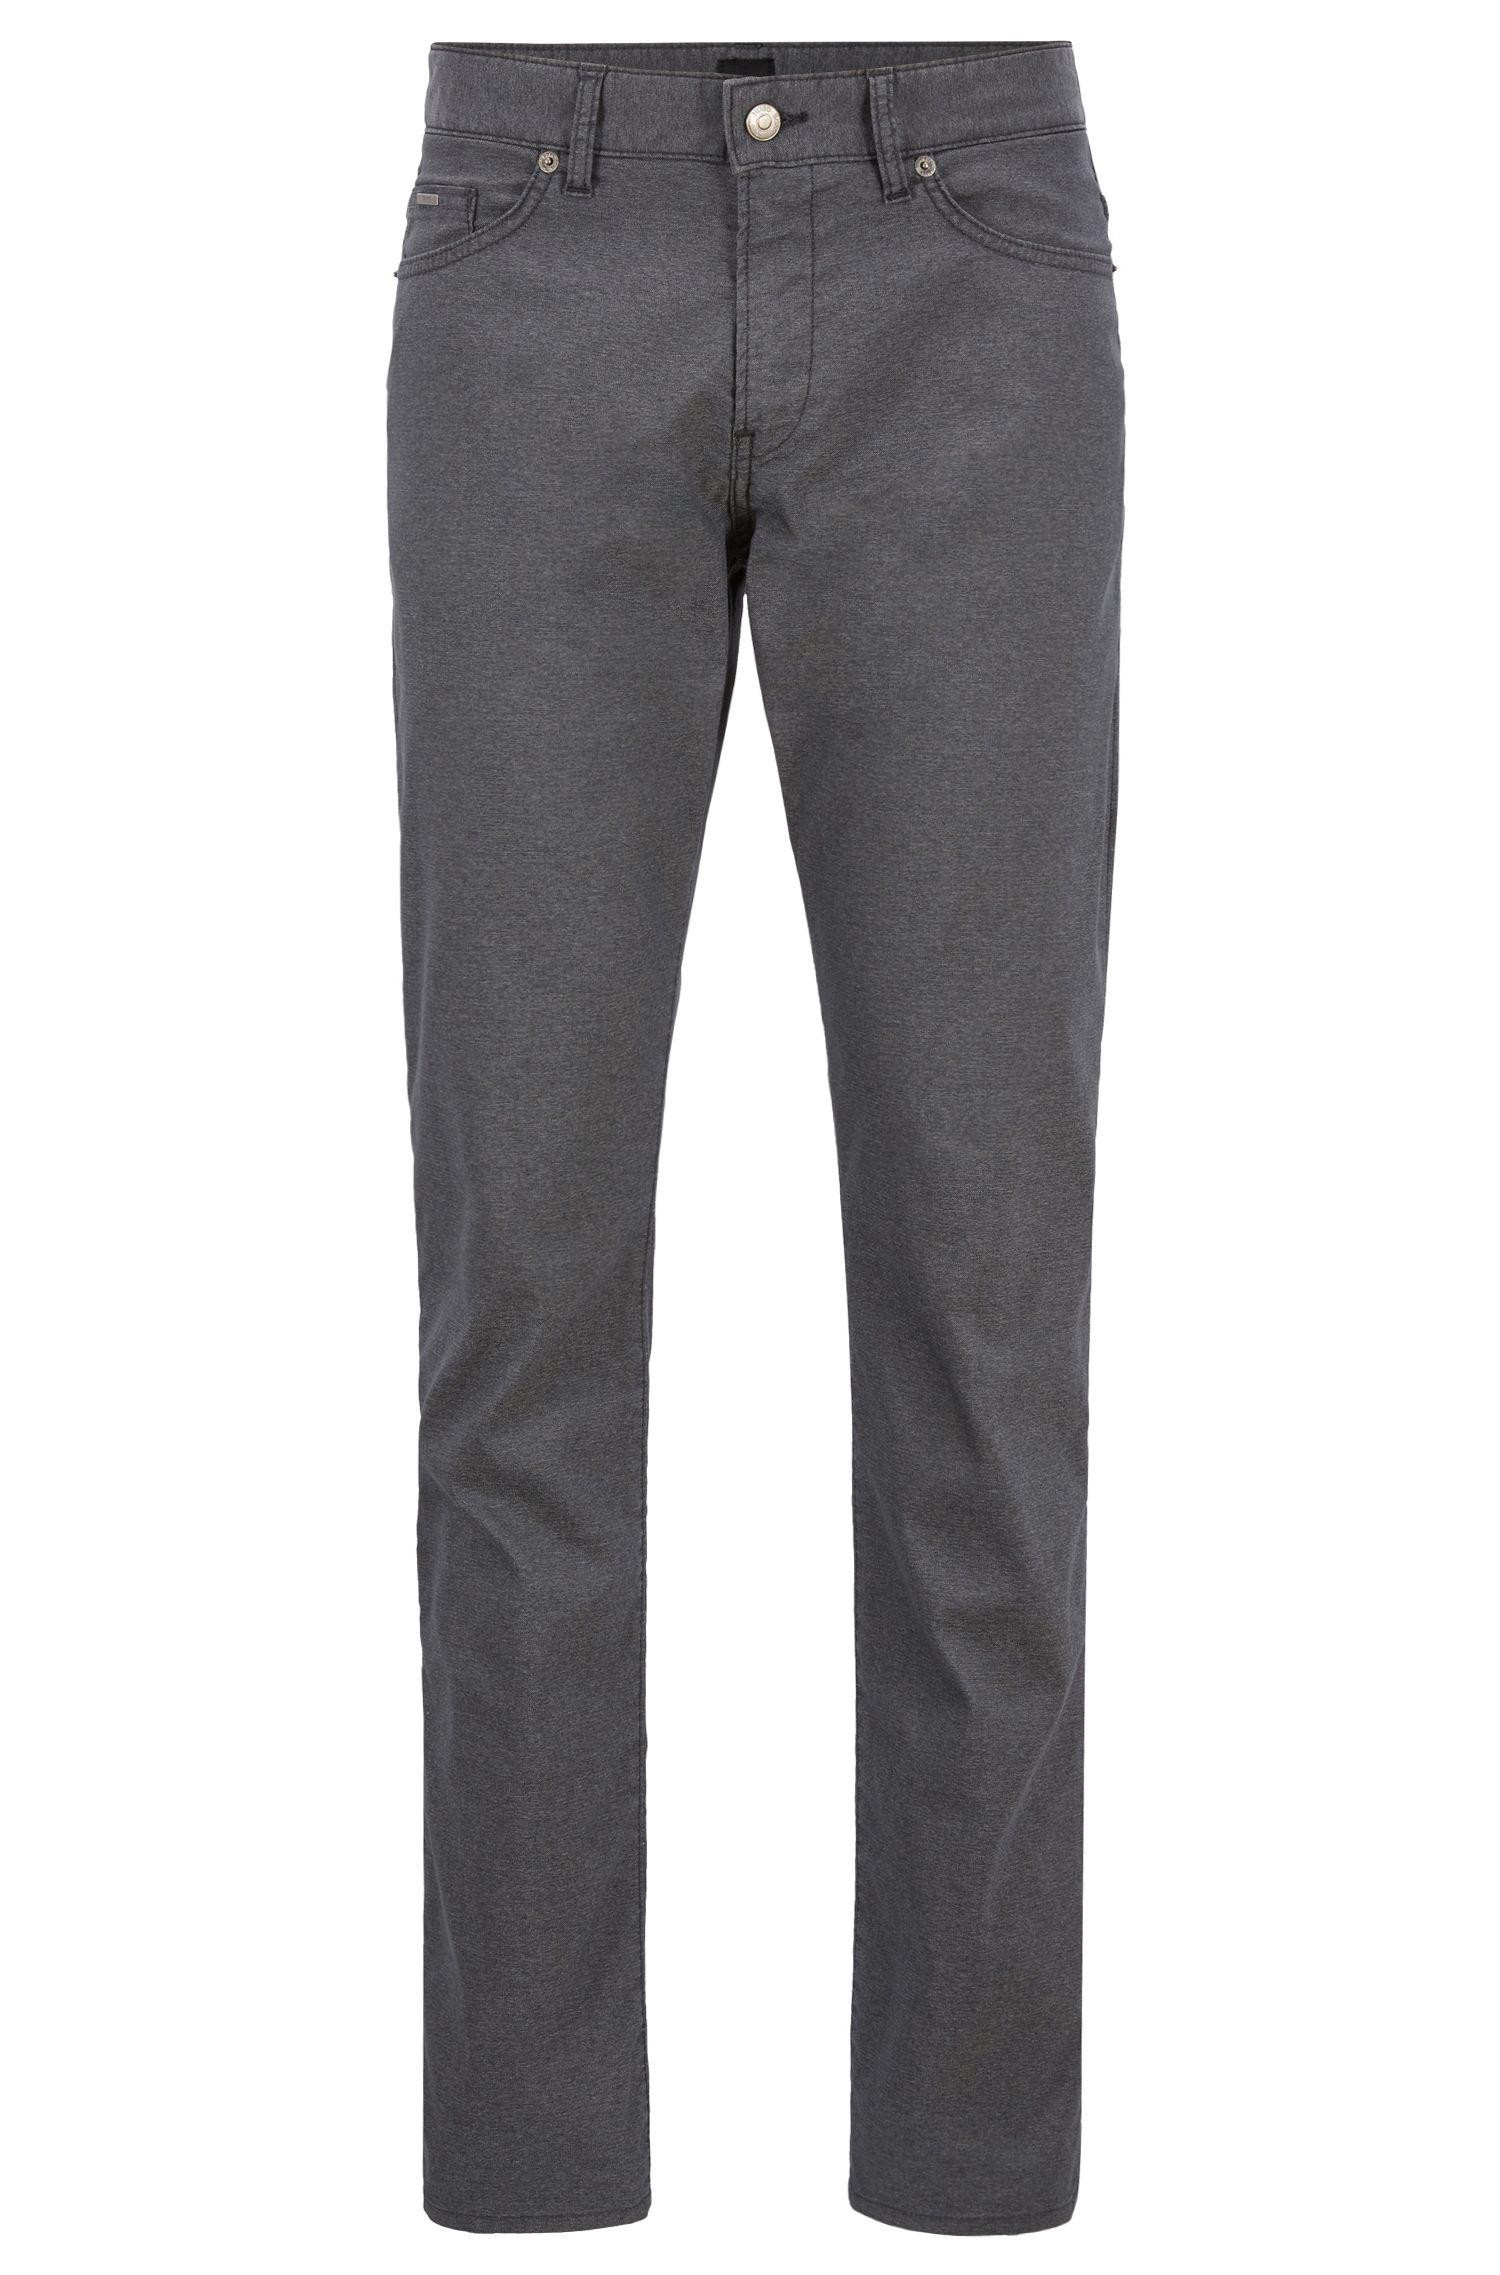 Slim-fit jeans in Italian stretch fabric, Grey